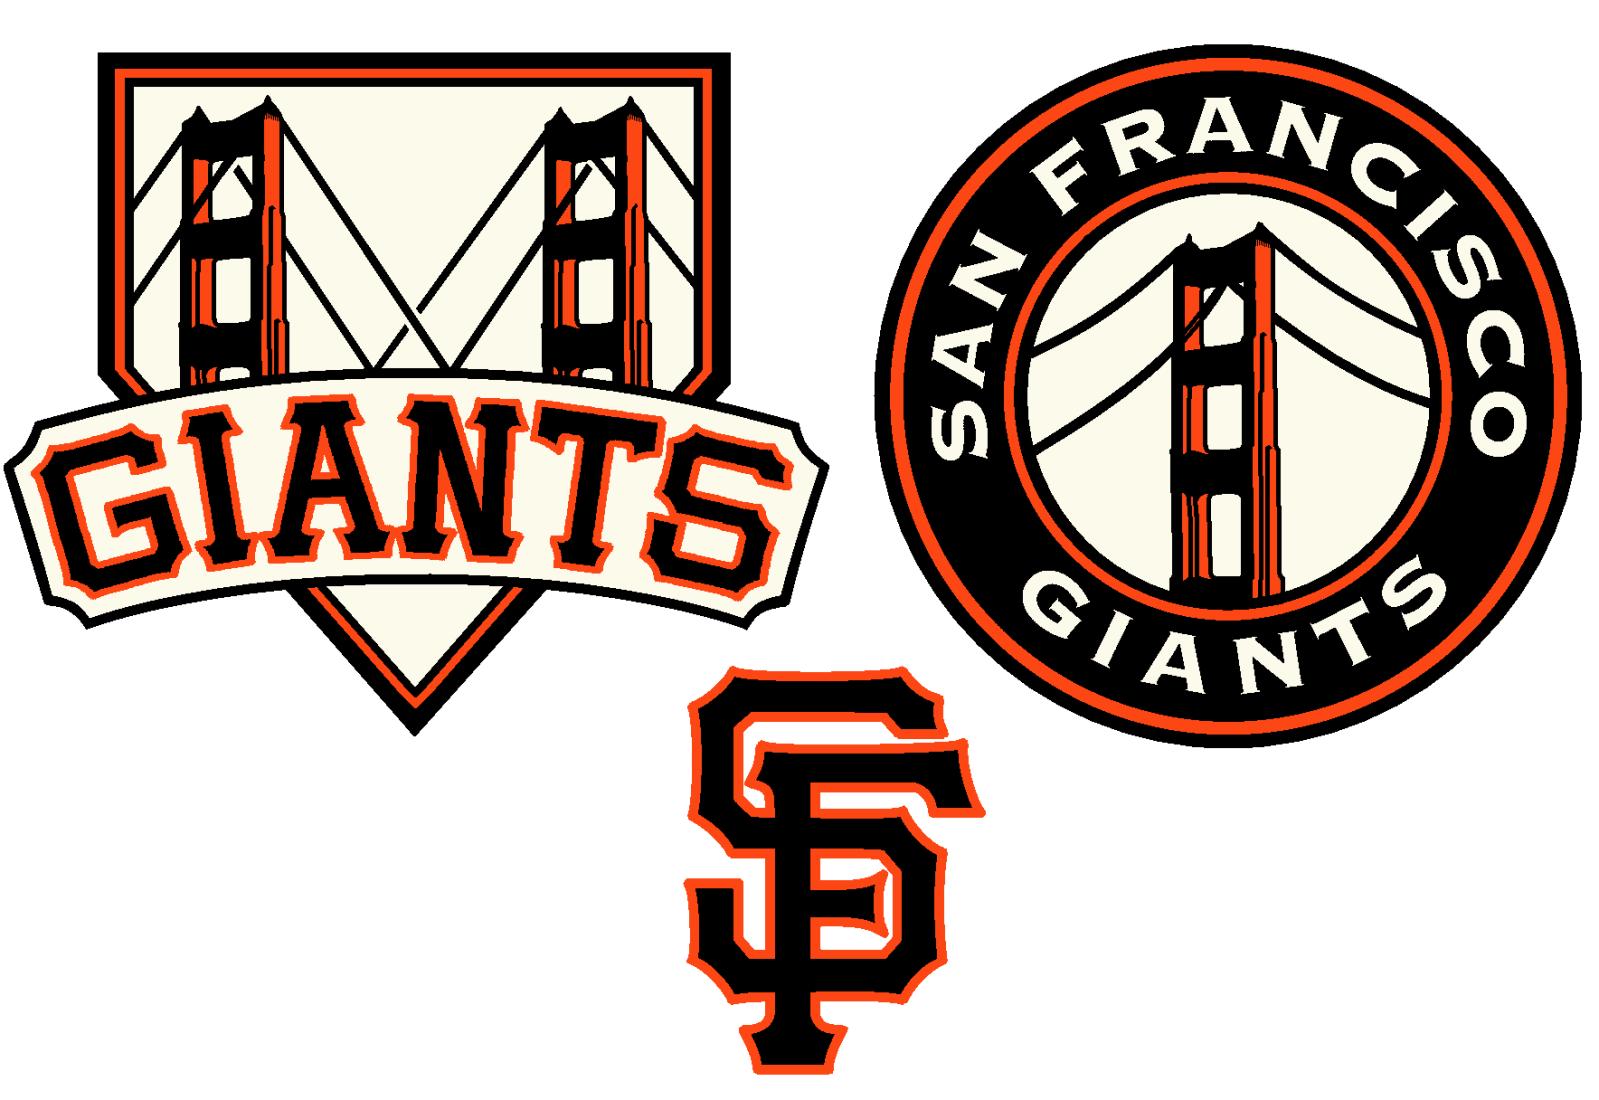 San Francisco Giants Clipart - Clipart Suggest